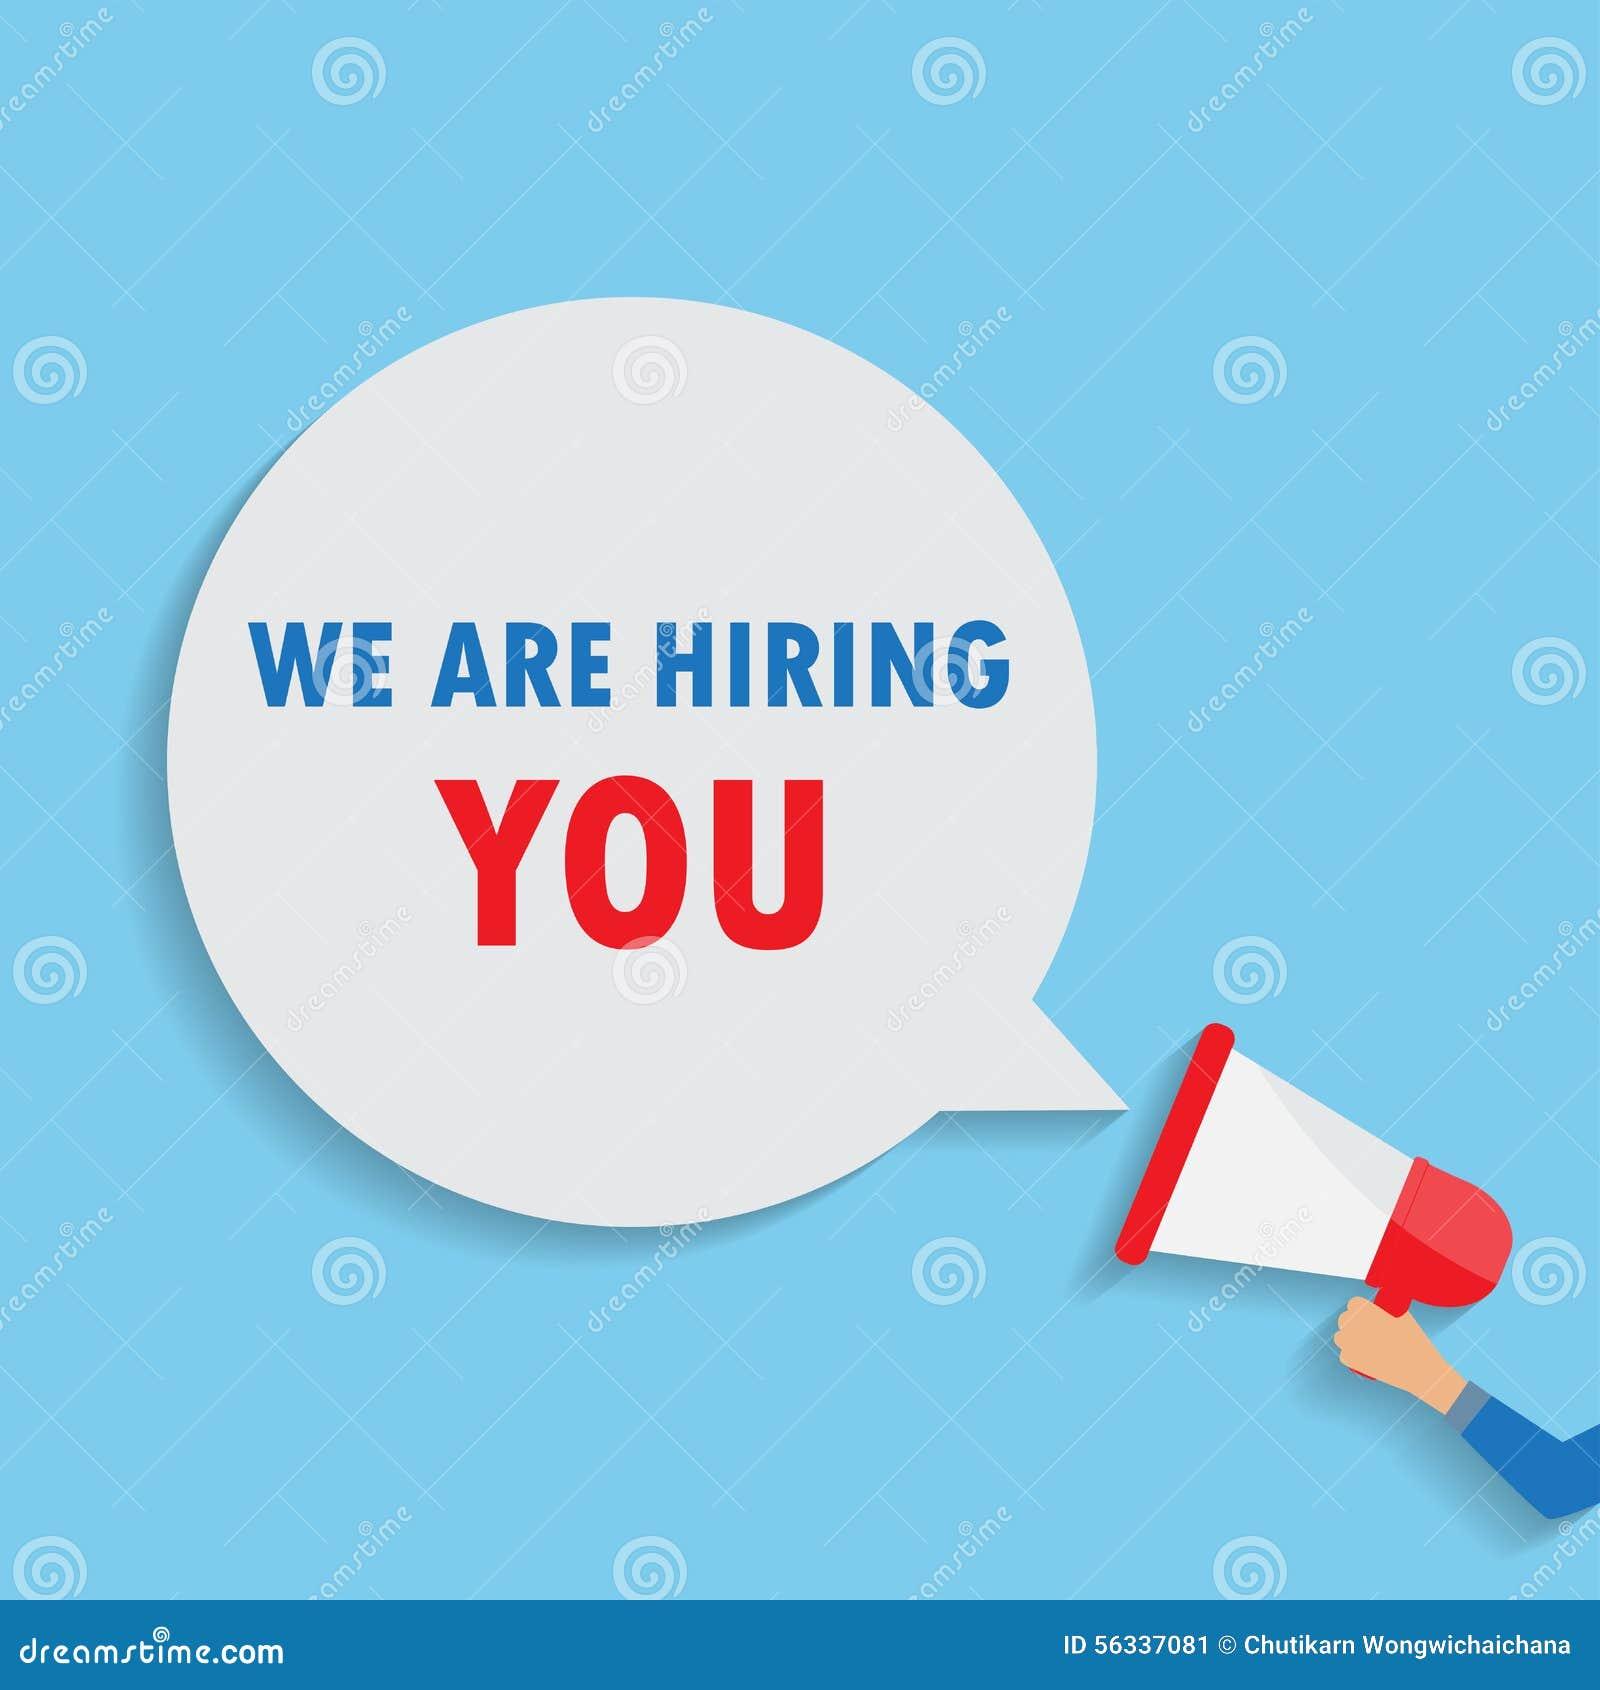 Job Announcement Stock Vector - Image: 56337081